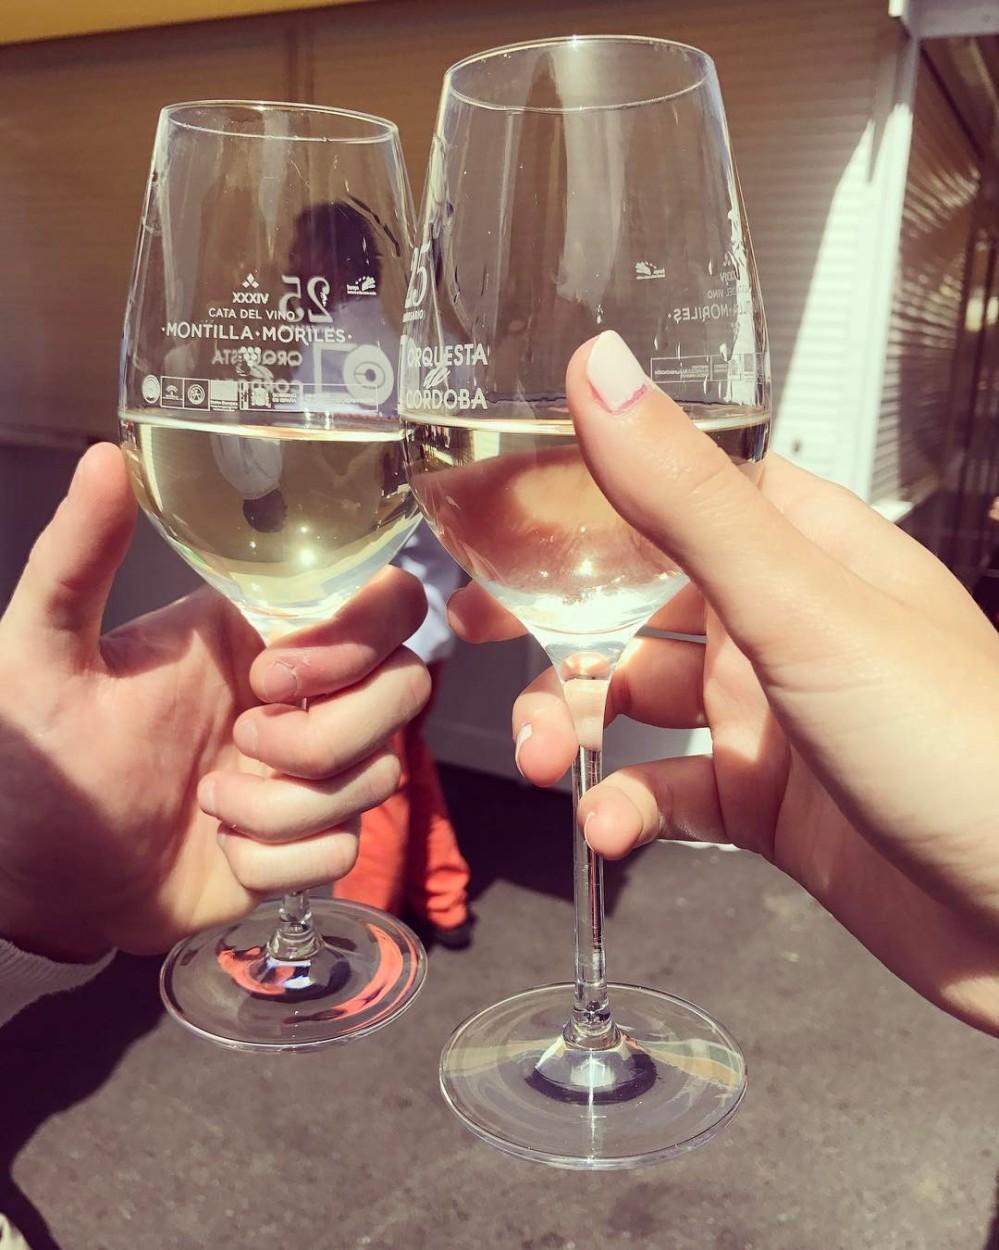 montilla moriles wine